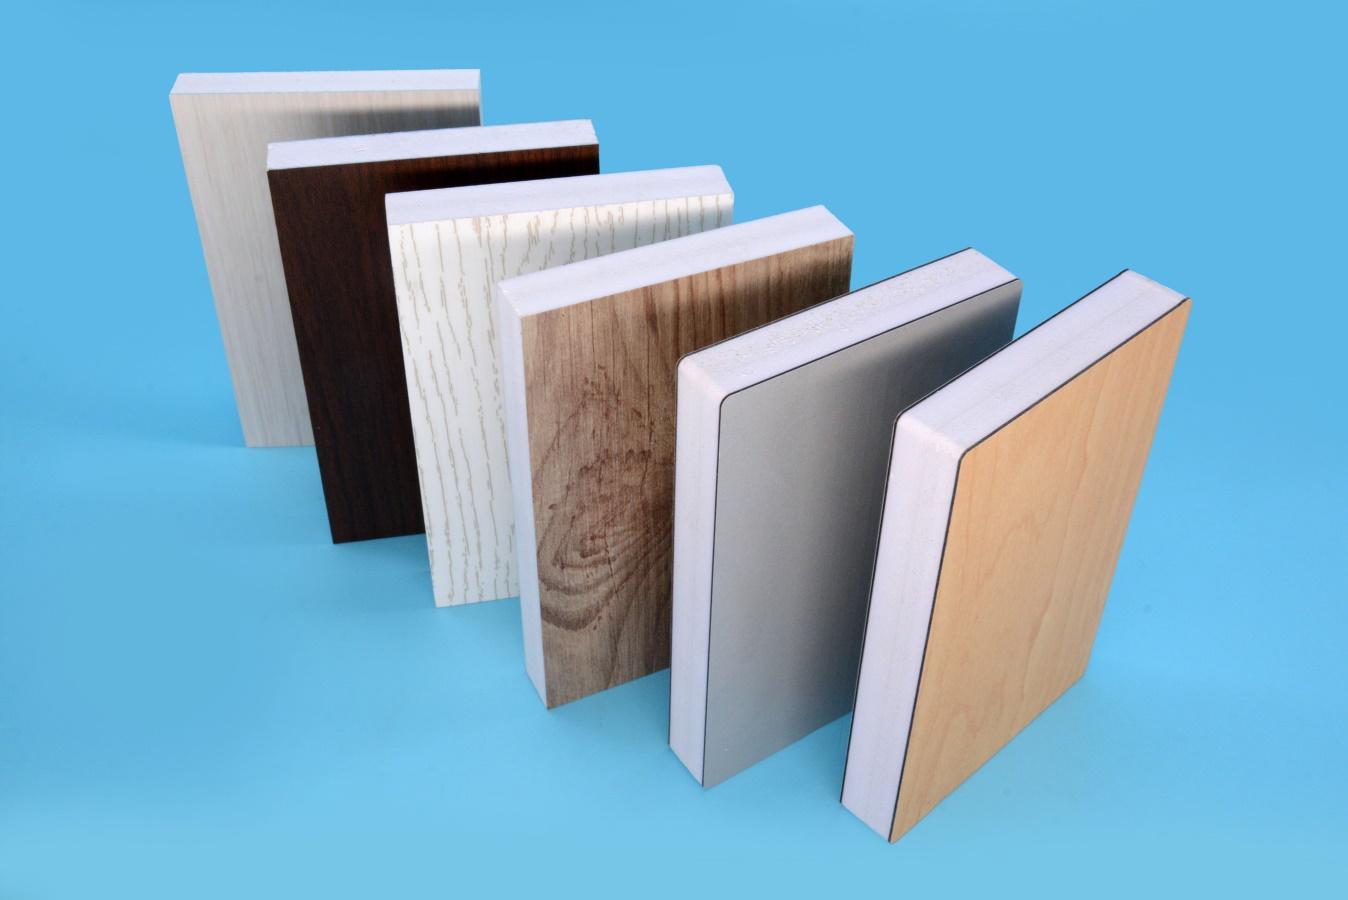 0.5mm  aluminium sheet laiminated board sheet for furniture